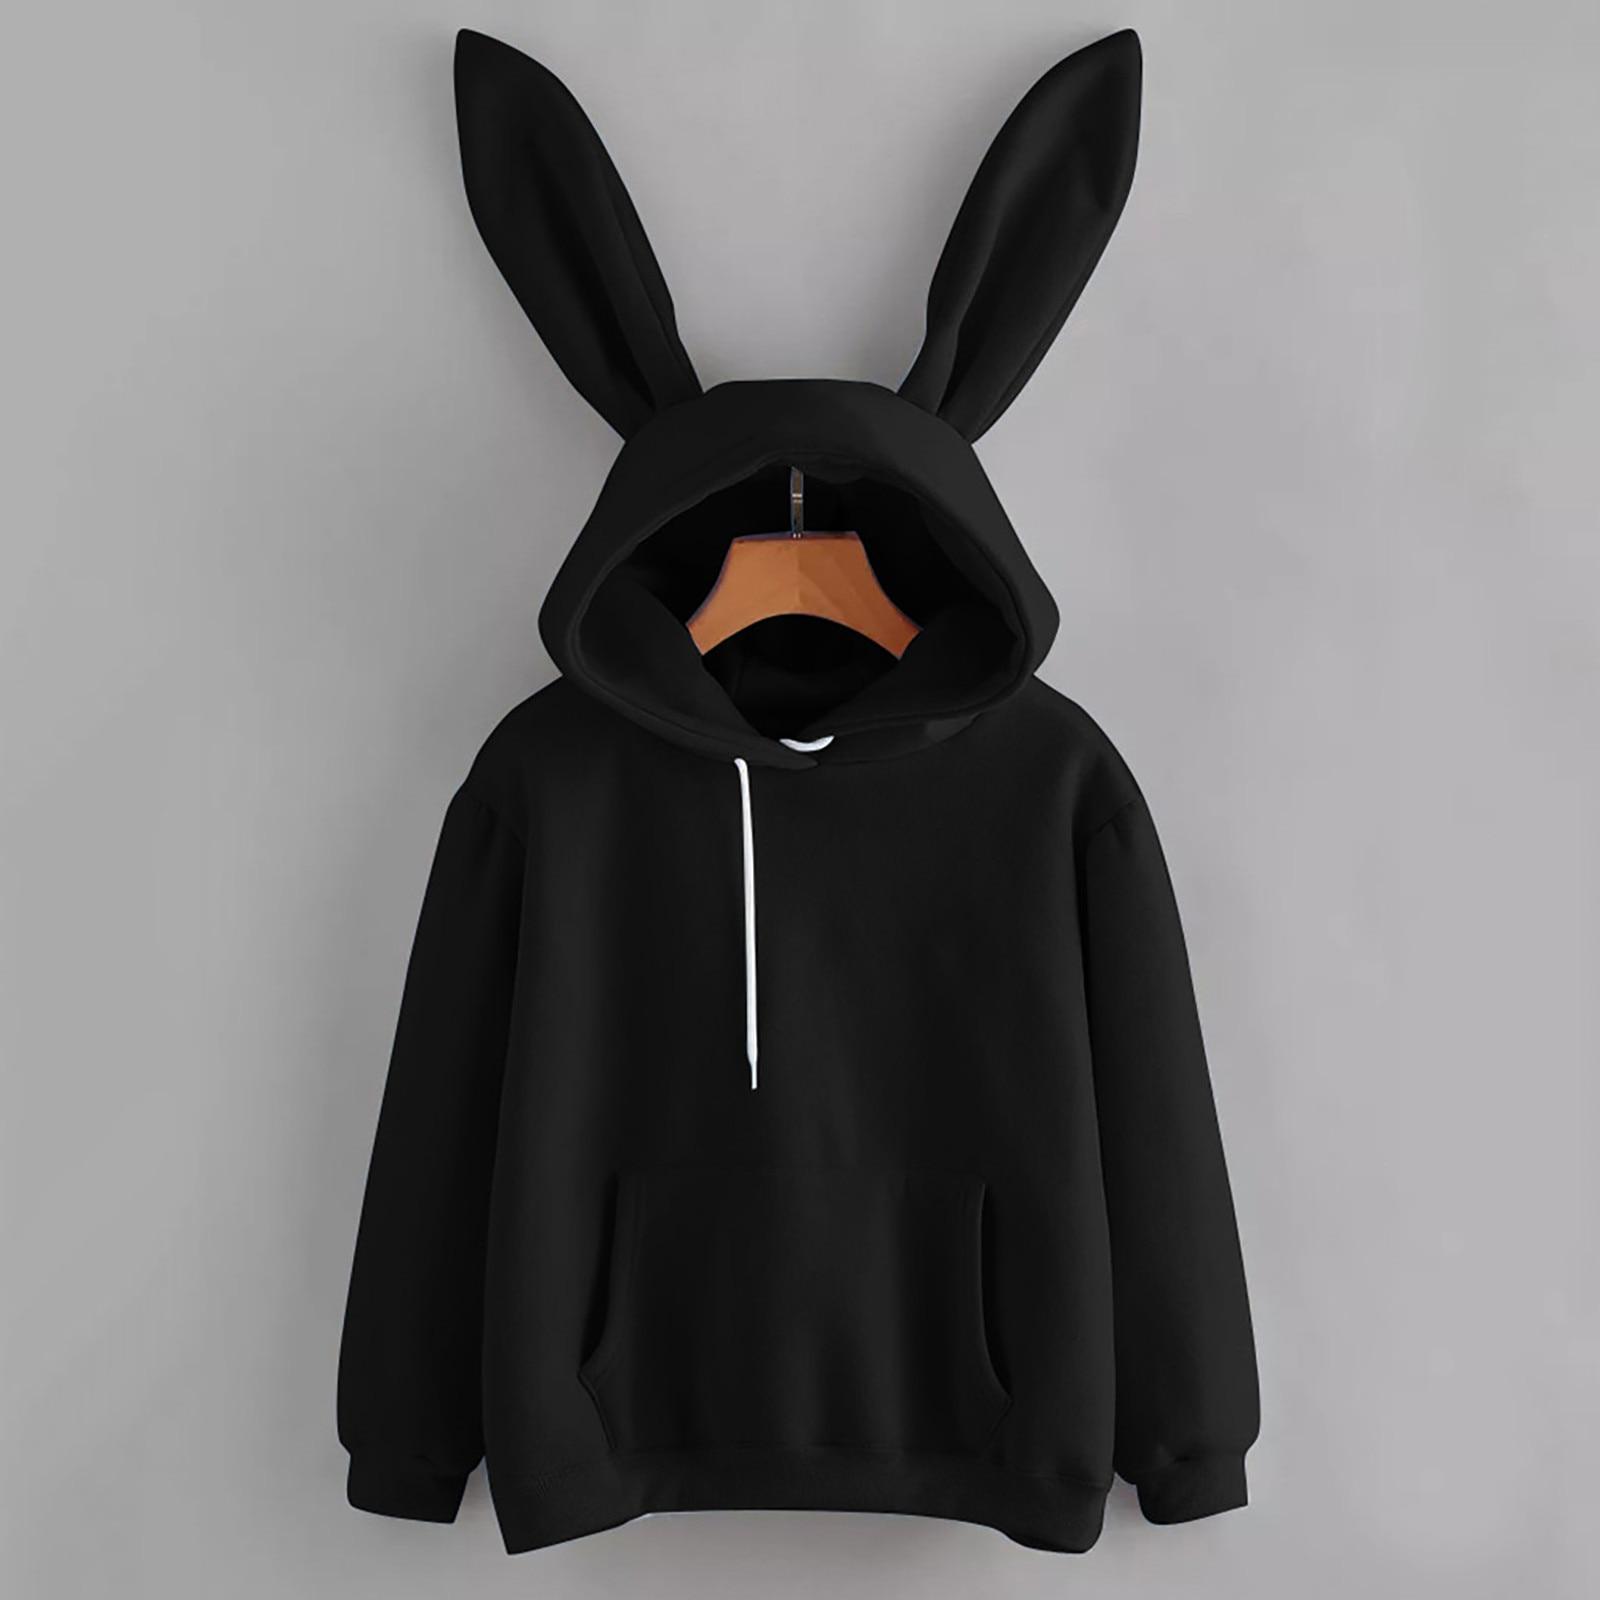 Top Verkauf Kaninchen Lange Ohren Frauen Hoodie Langarm Solide Harajuku Sweatshirt Pullover Kawaii Casual Damen Hoody Kleidung